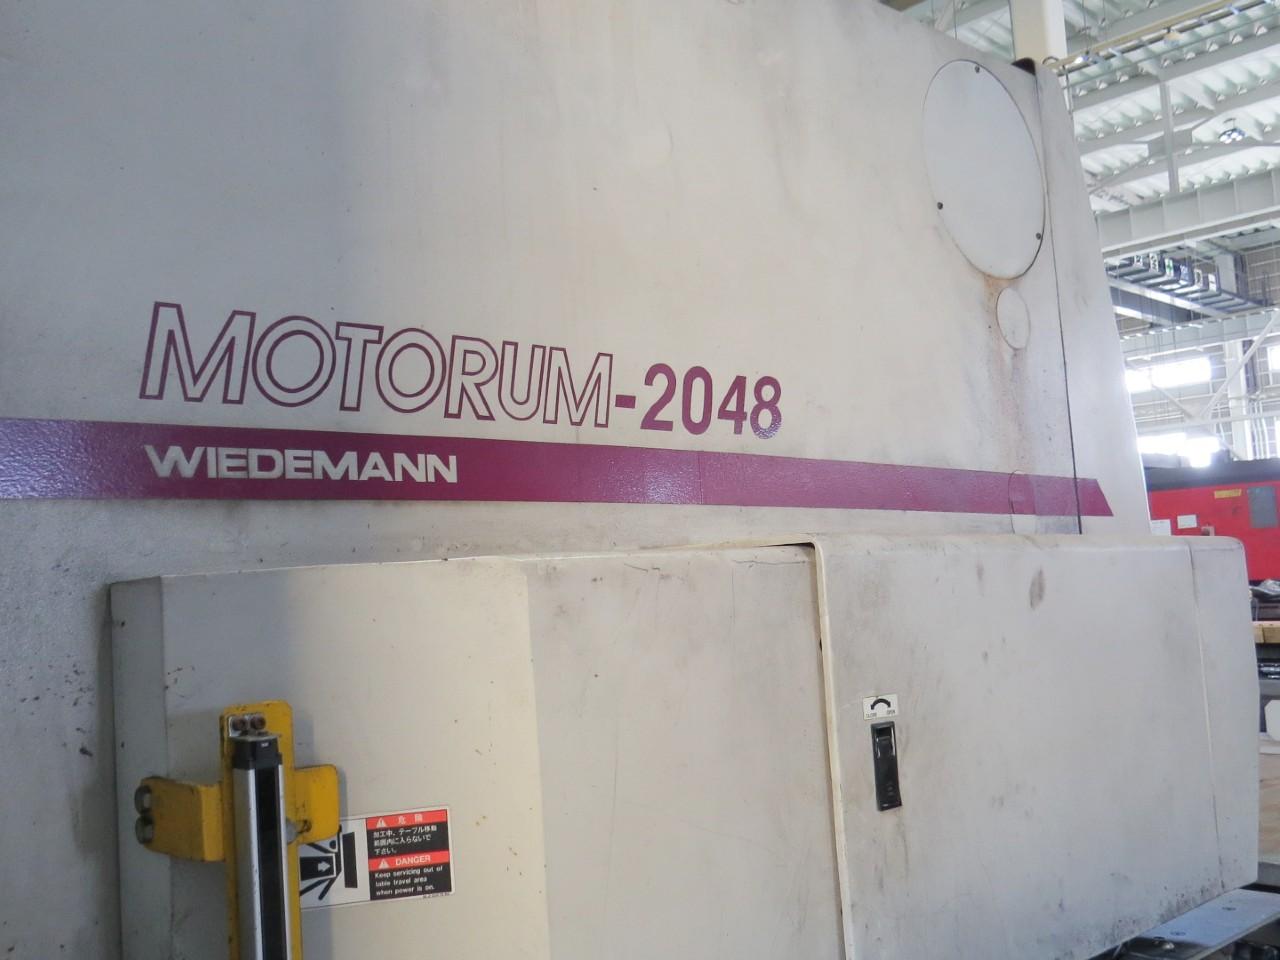 MOTORUM-2048の型式表示部分